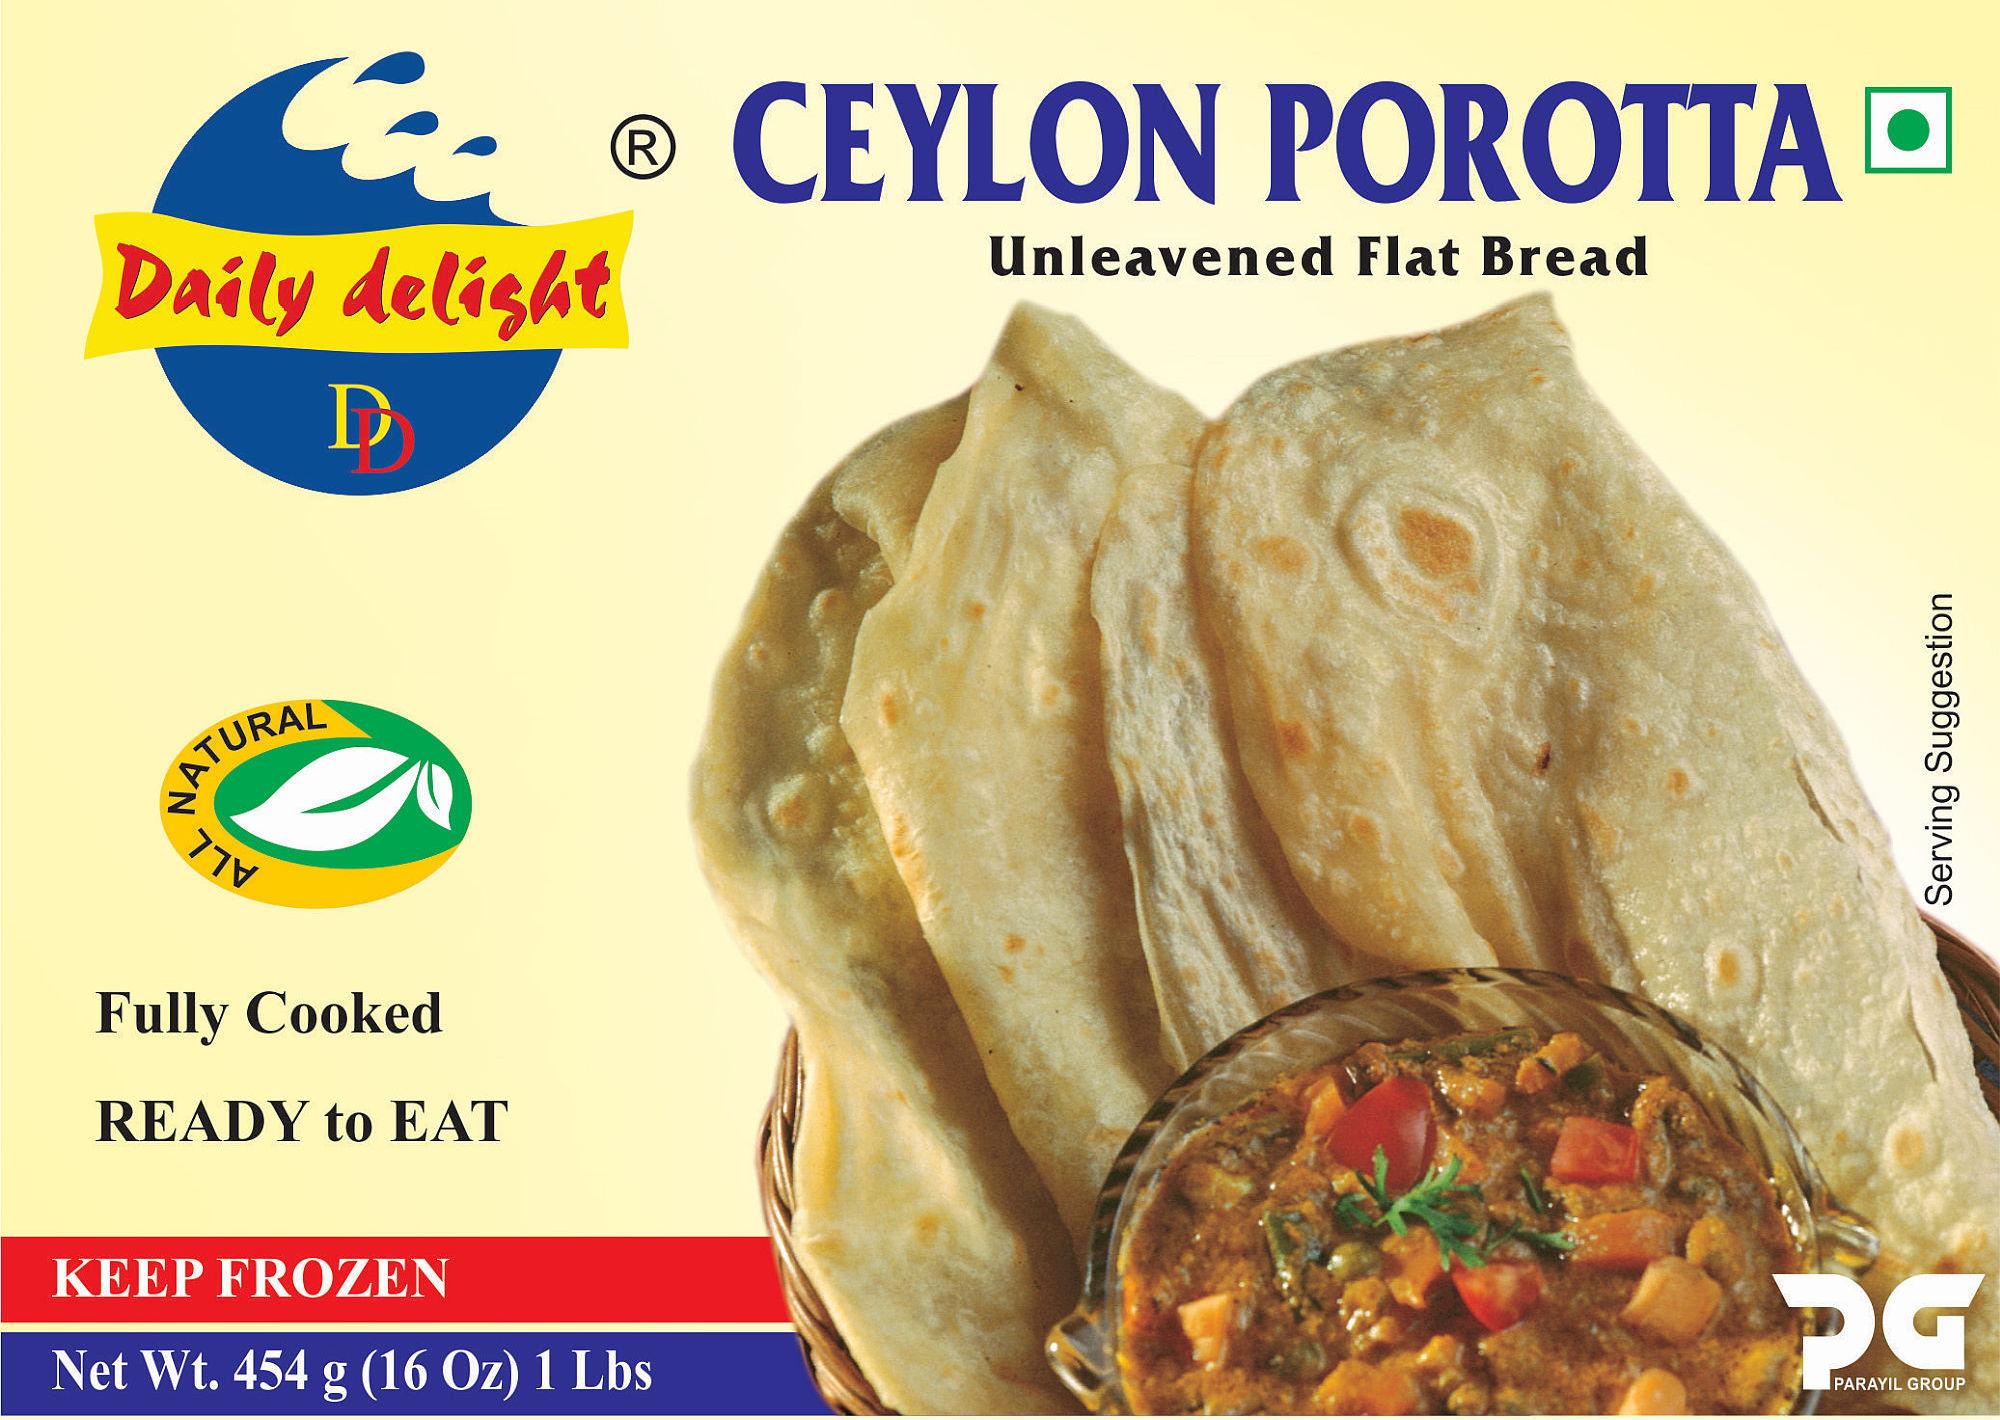 Daily Delight Ceylon Porotta